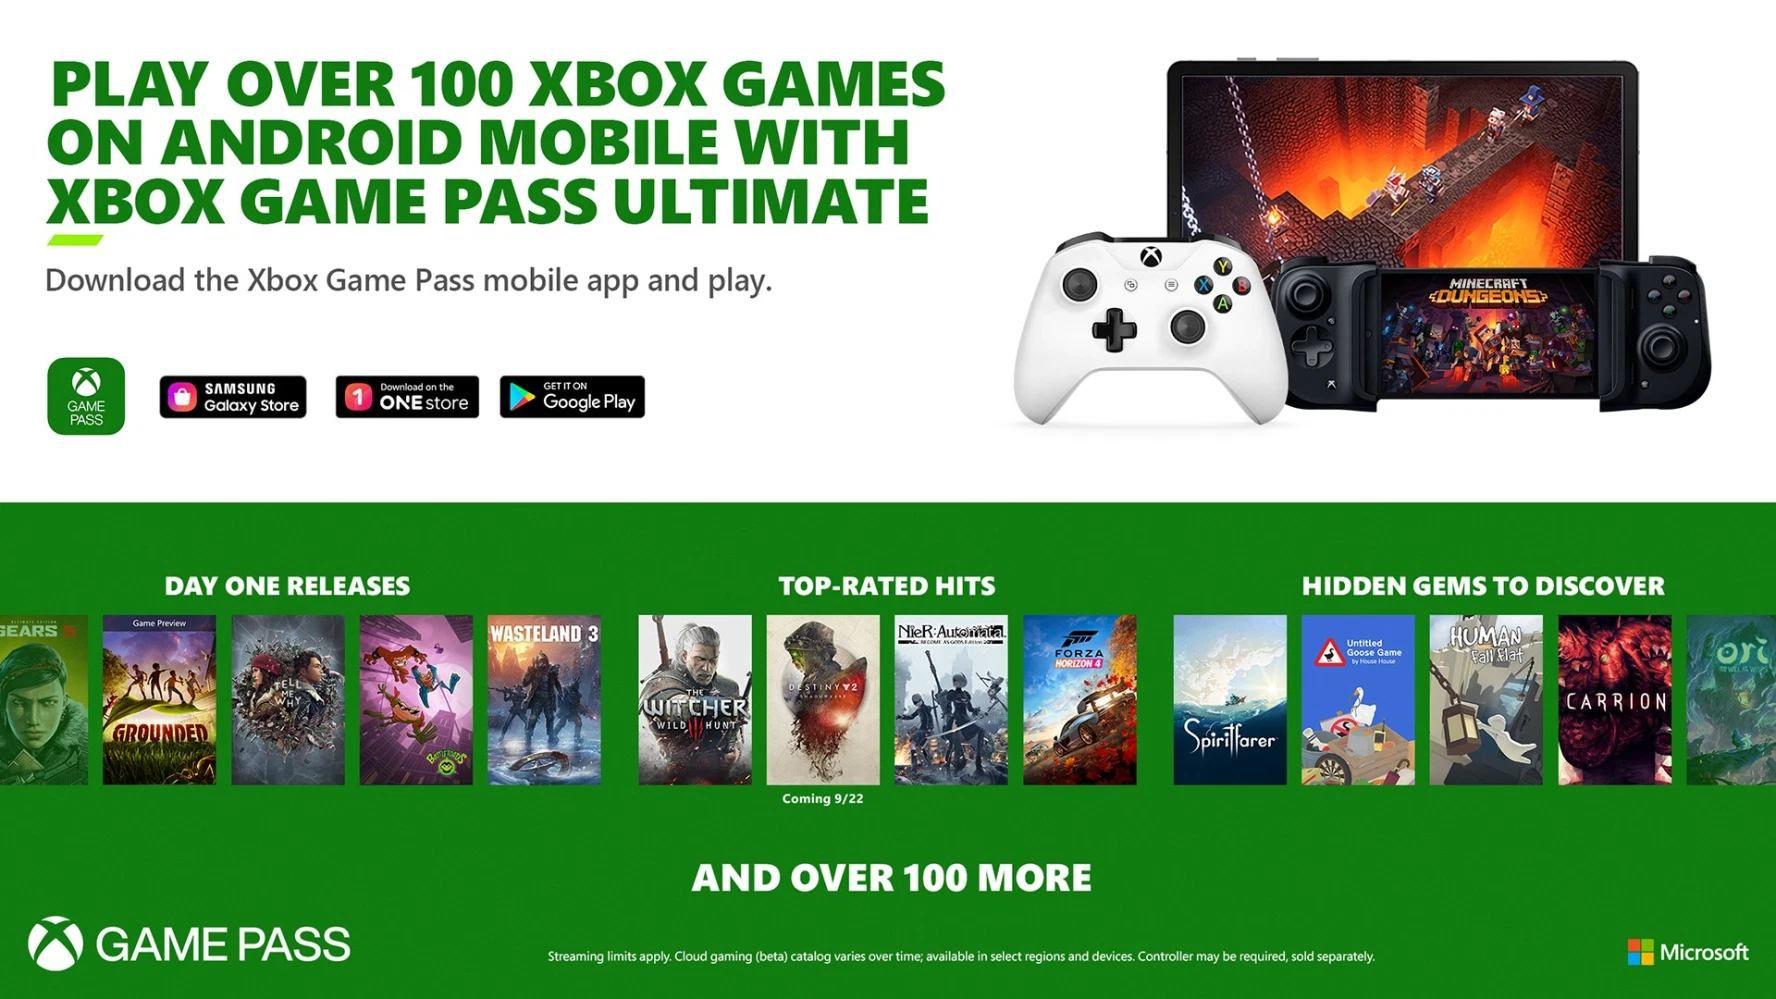 https://images.everyeye.it/img-notizie/xbox-game-pass-ultimate-accoglie-cloud-gaming-150-giochi-disponibili-lancio-v4-468488.jpg